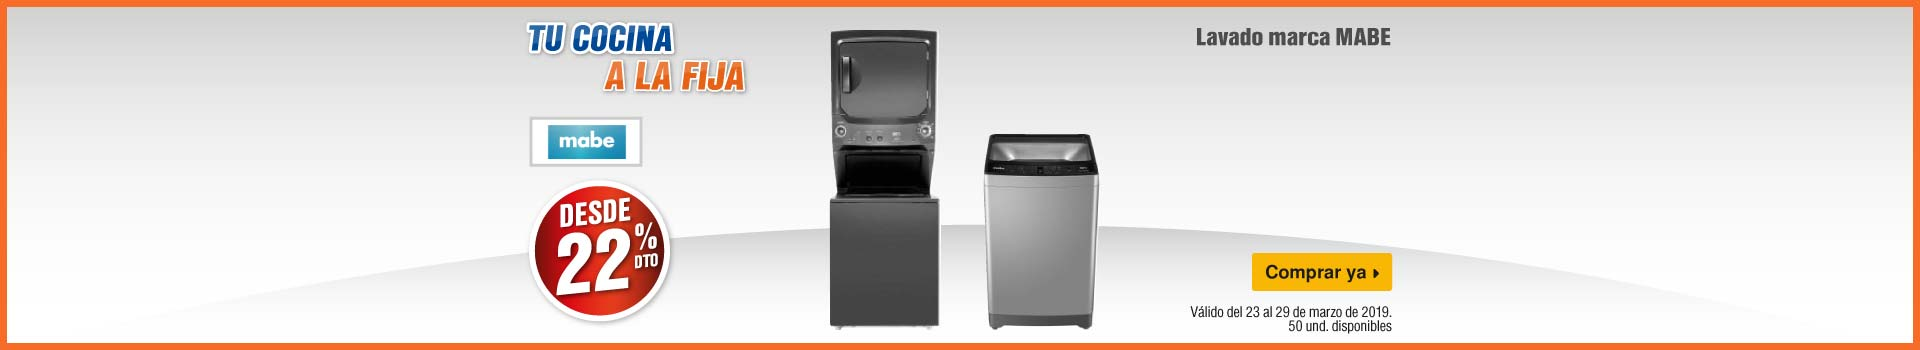 AK-KT-mayores-2-ELECT-BCAT-lavadoras-mabe-230319